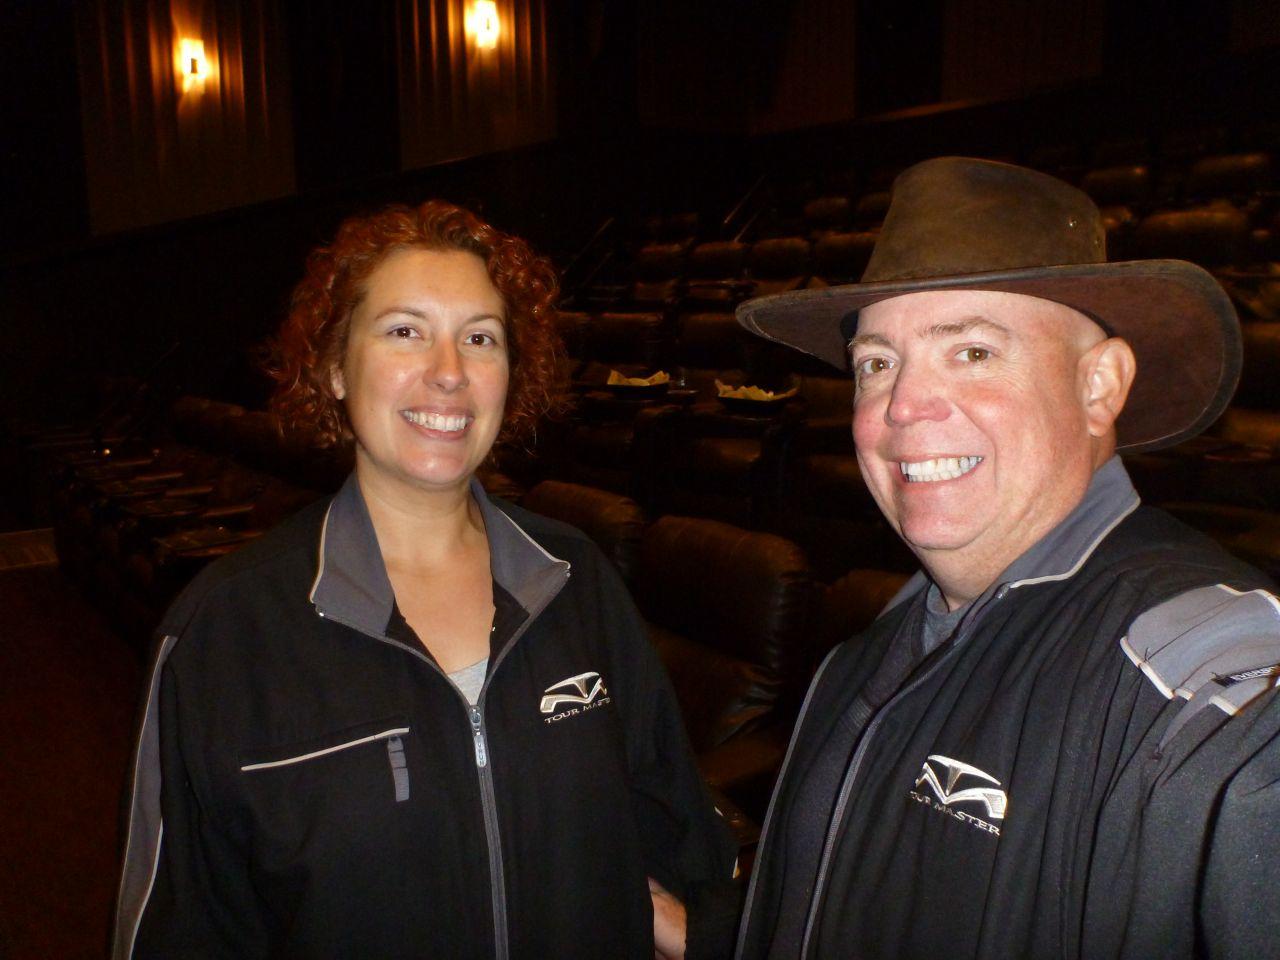 David & Brenda At The Moviehouse And Eatery